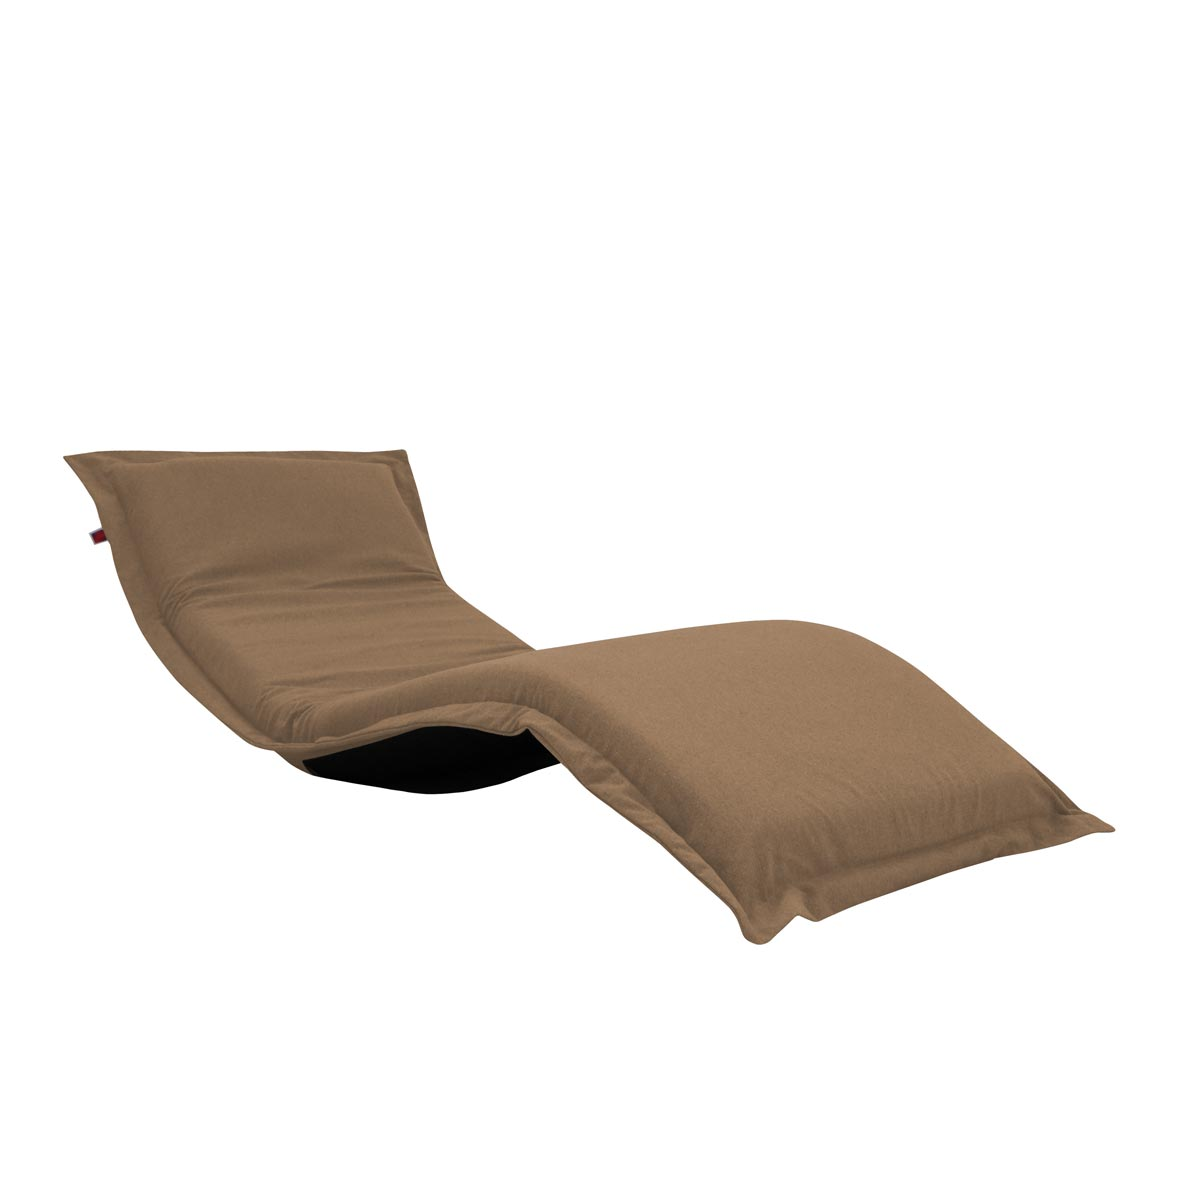 Pufe ClicClac Uno Lounge Tecido Ecolona Kraft 02 05